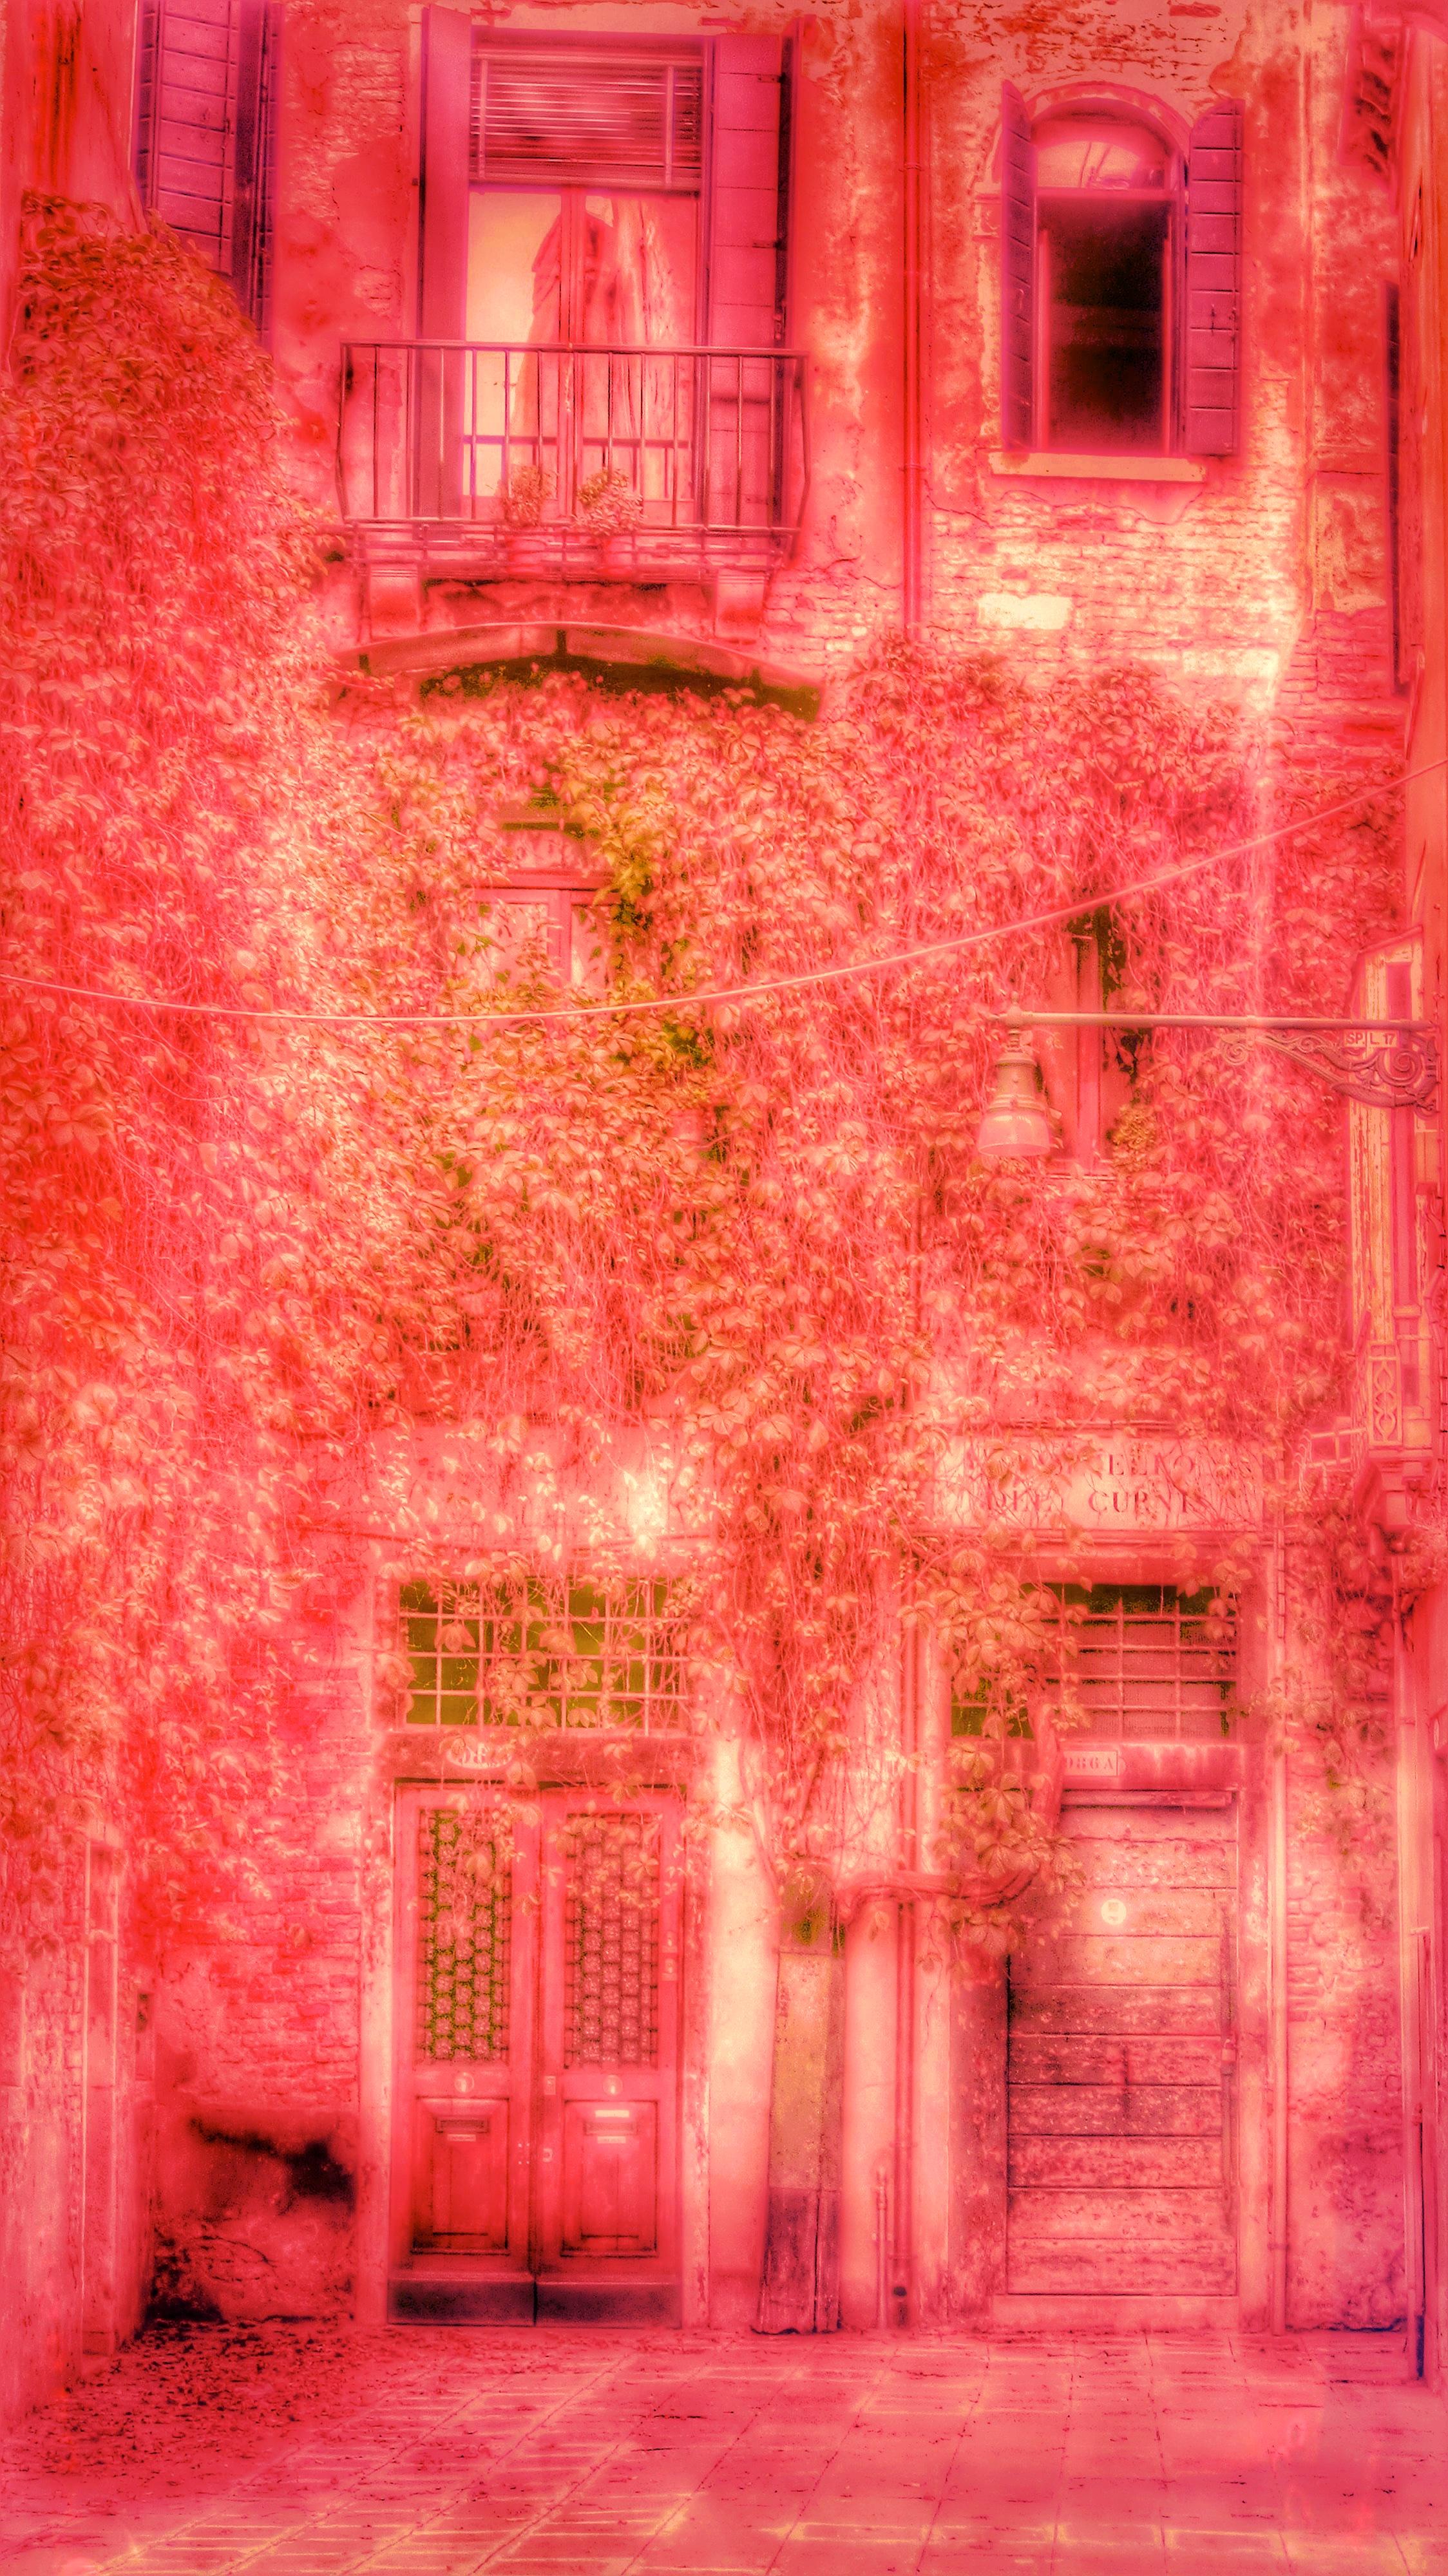 Painted Venice: Crimson